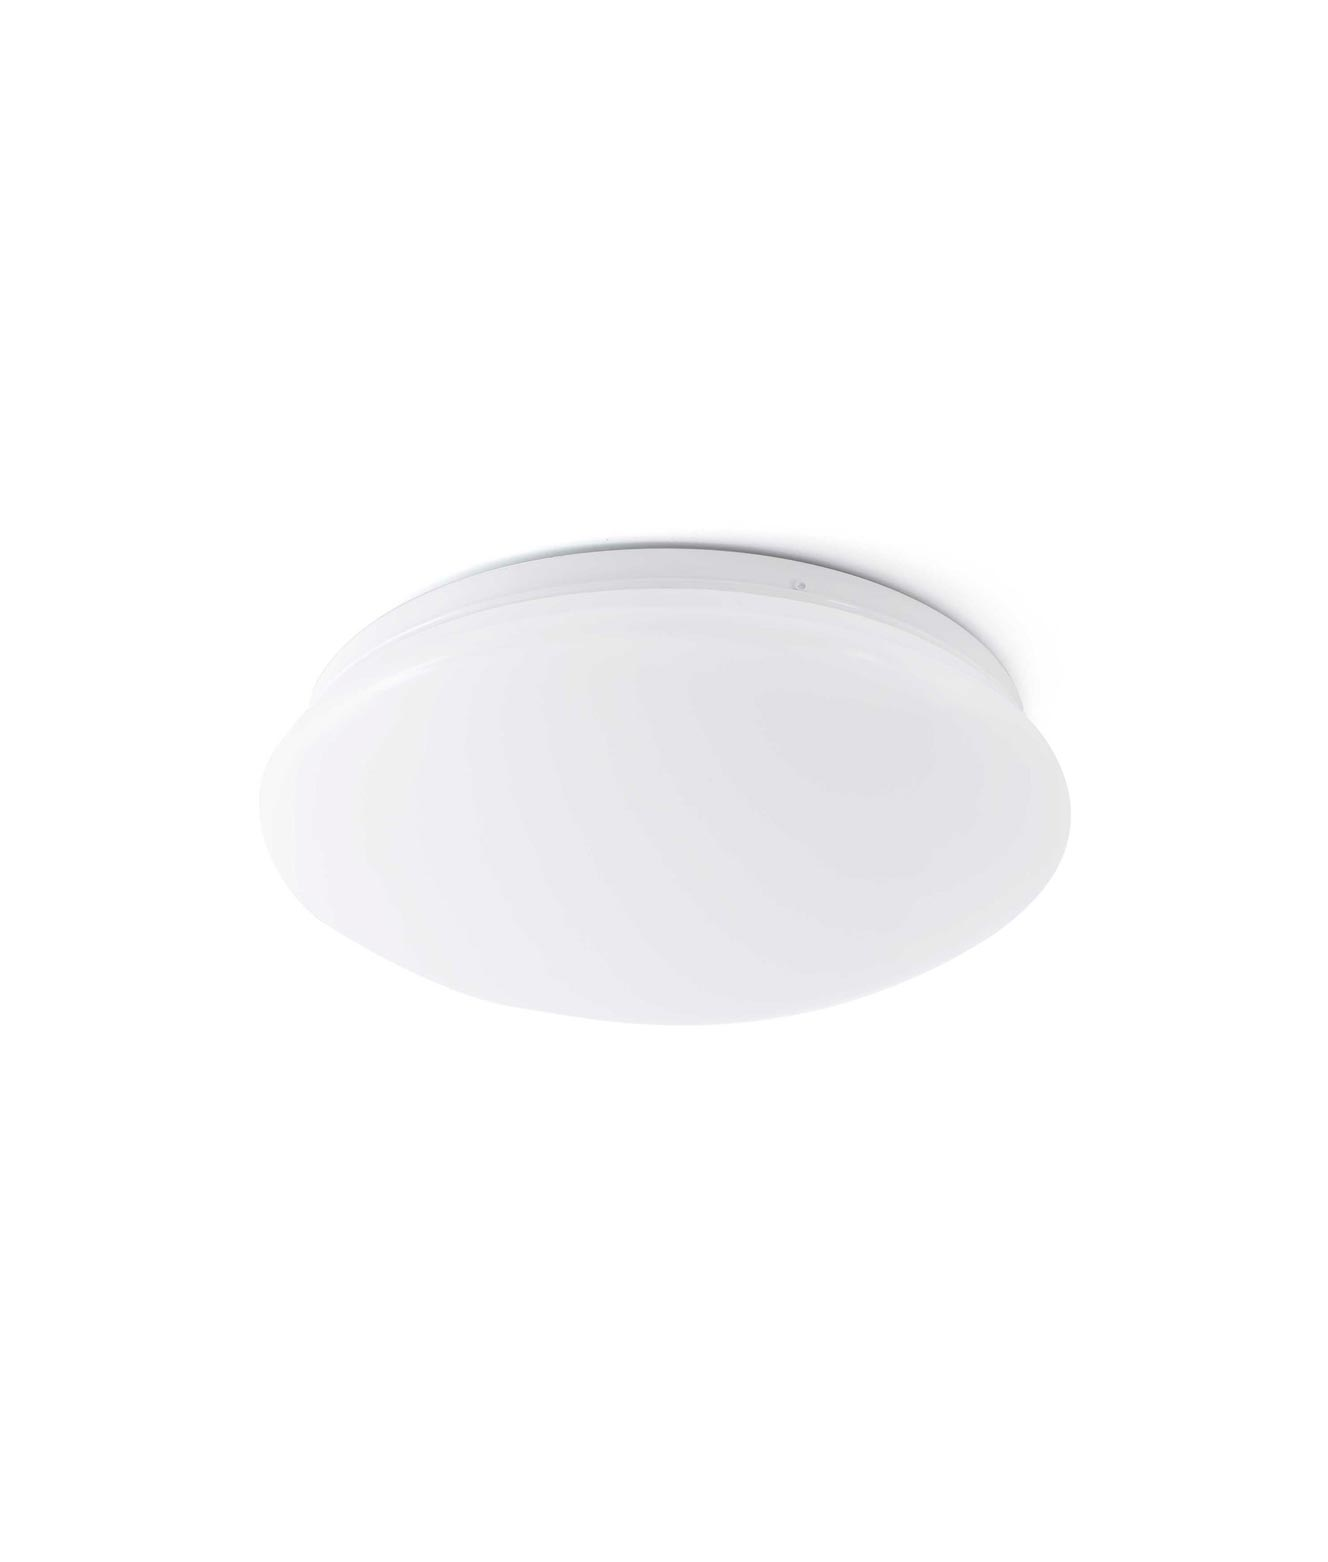 Plafón LED pequeño RONDA blanco